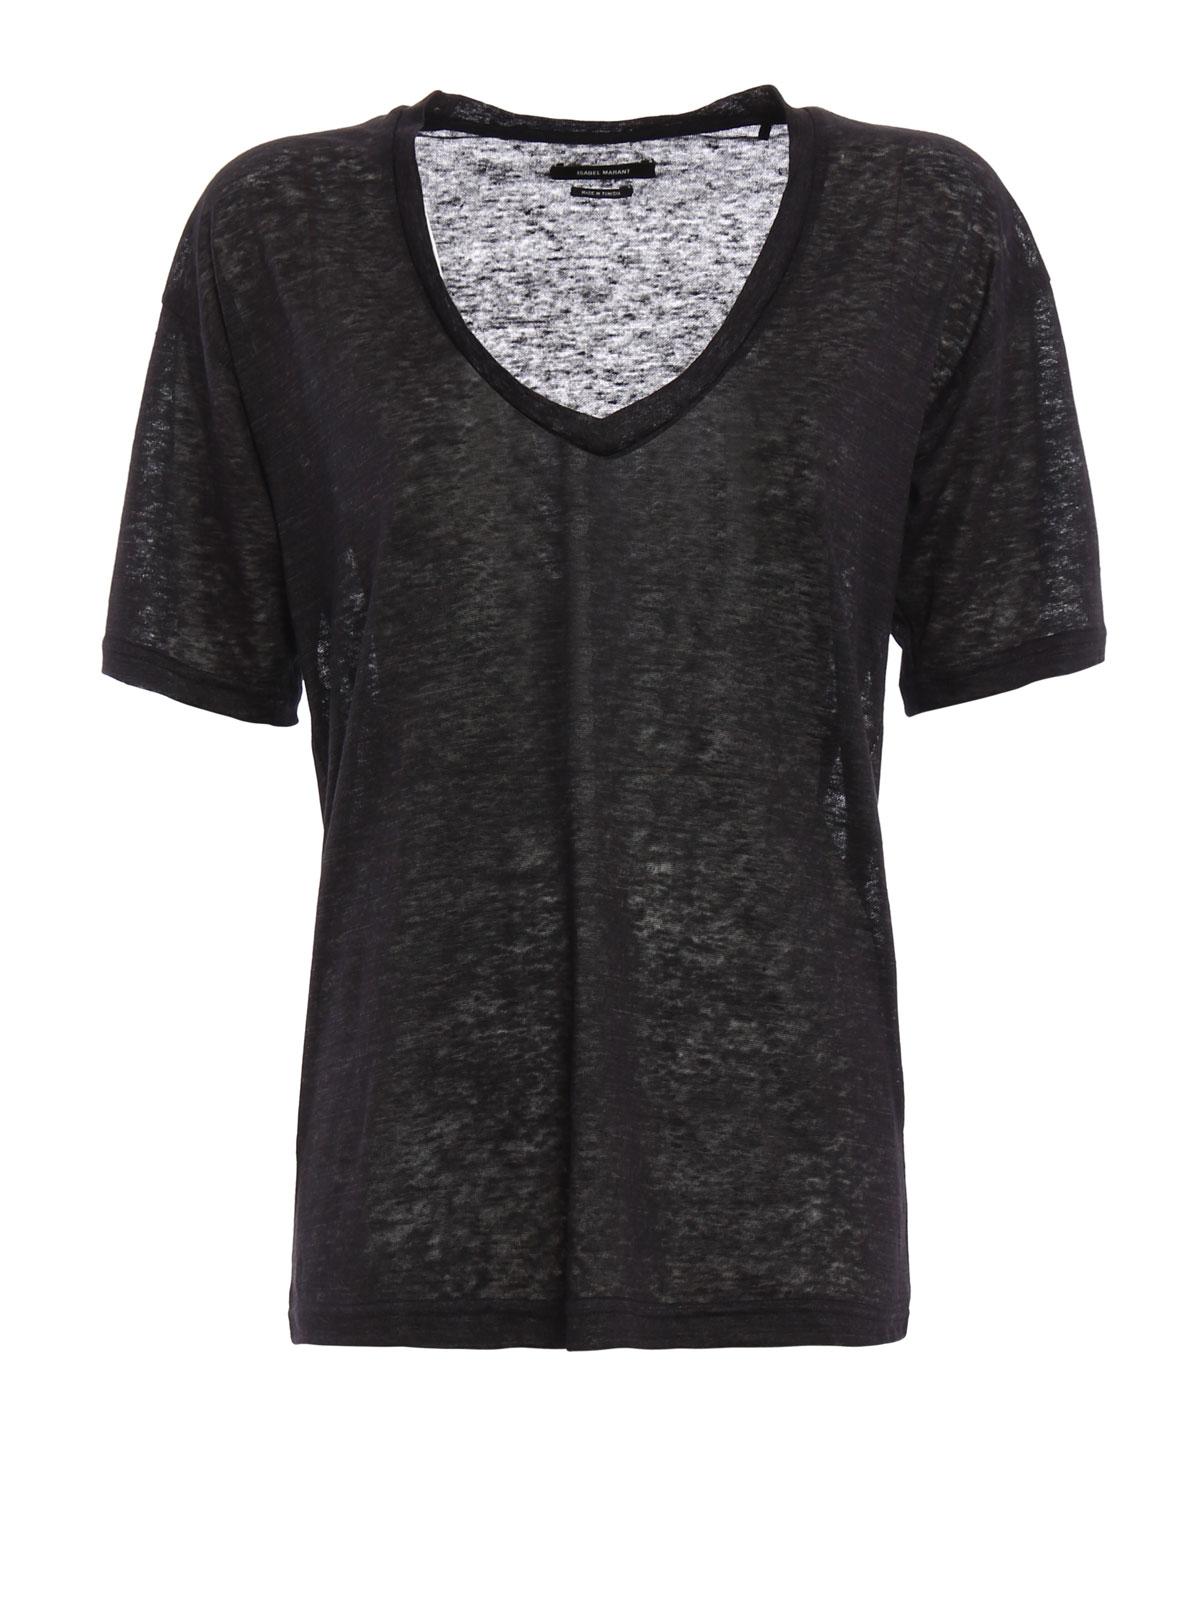 Isabel T Shirts Maree Marant Shirt 01bk 16p026i Linen Ts0308 rxthCQsd